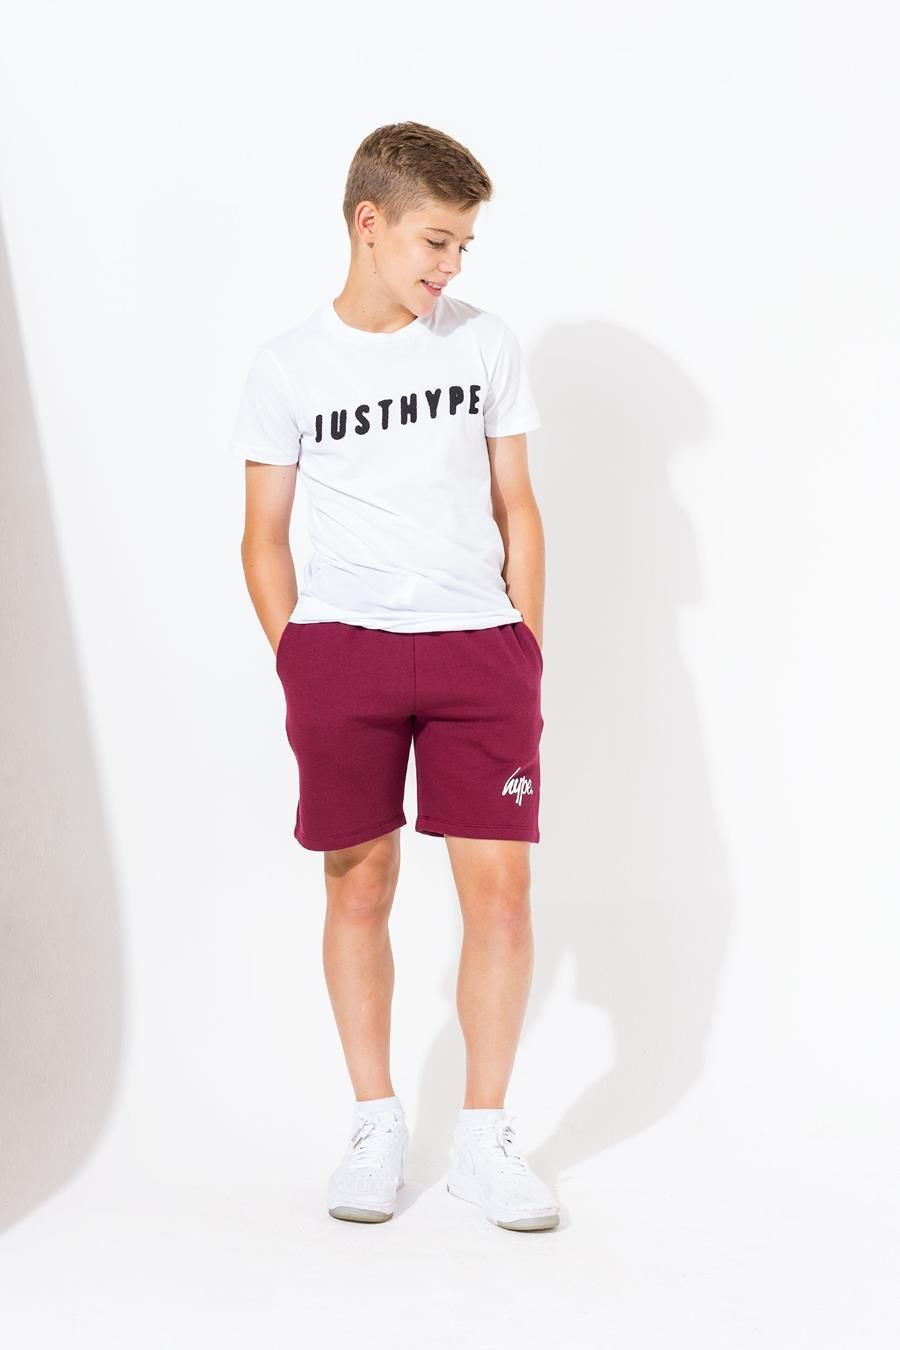 Hype Burgundy Script Kids Shorts